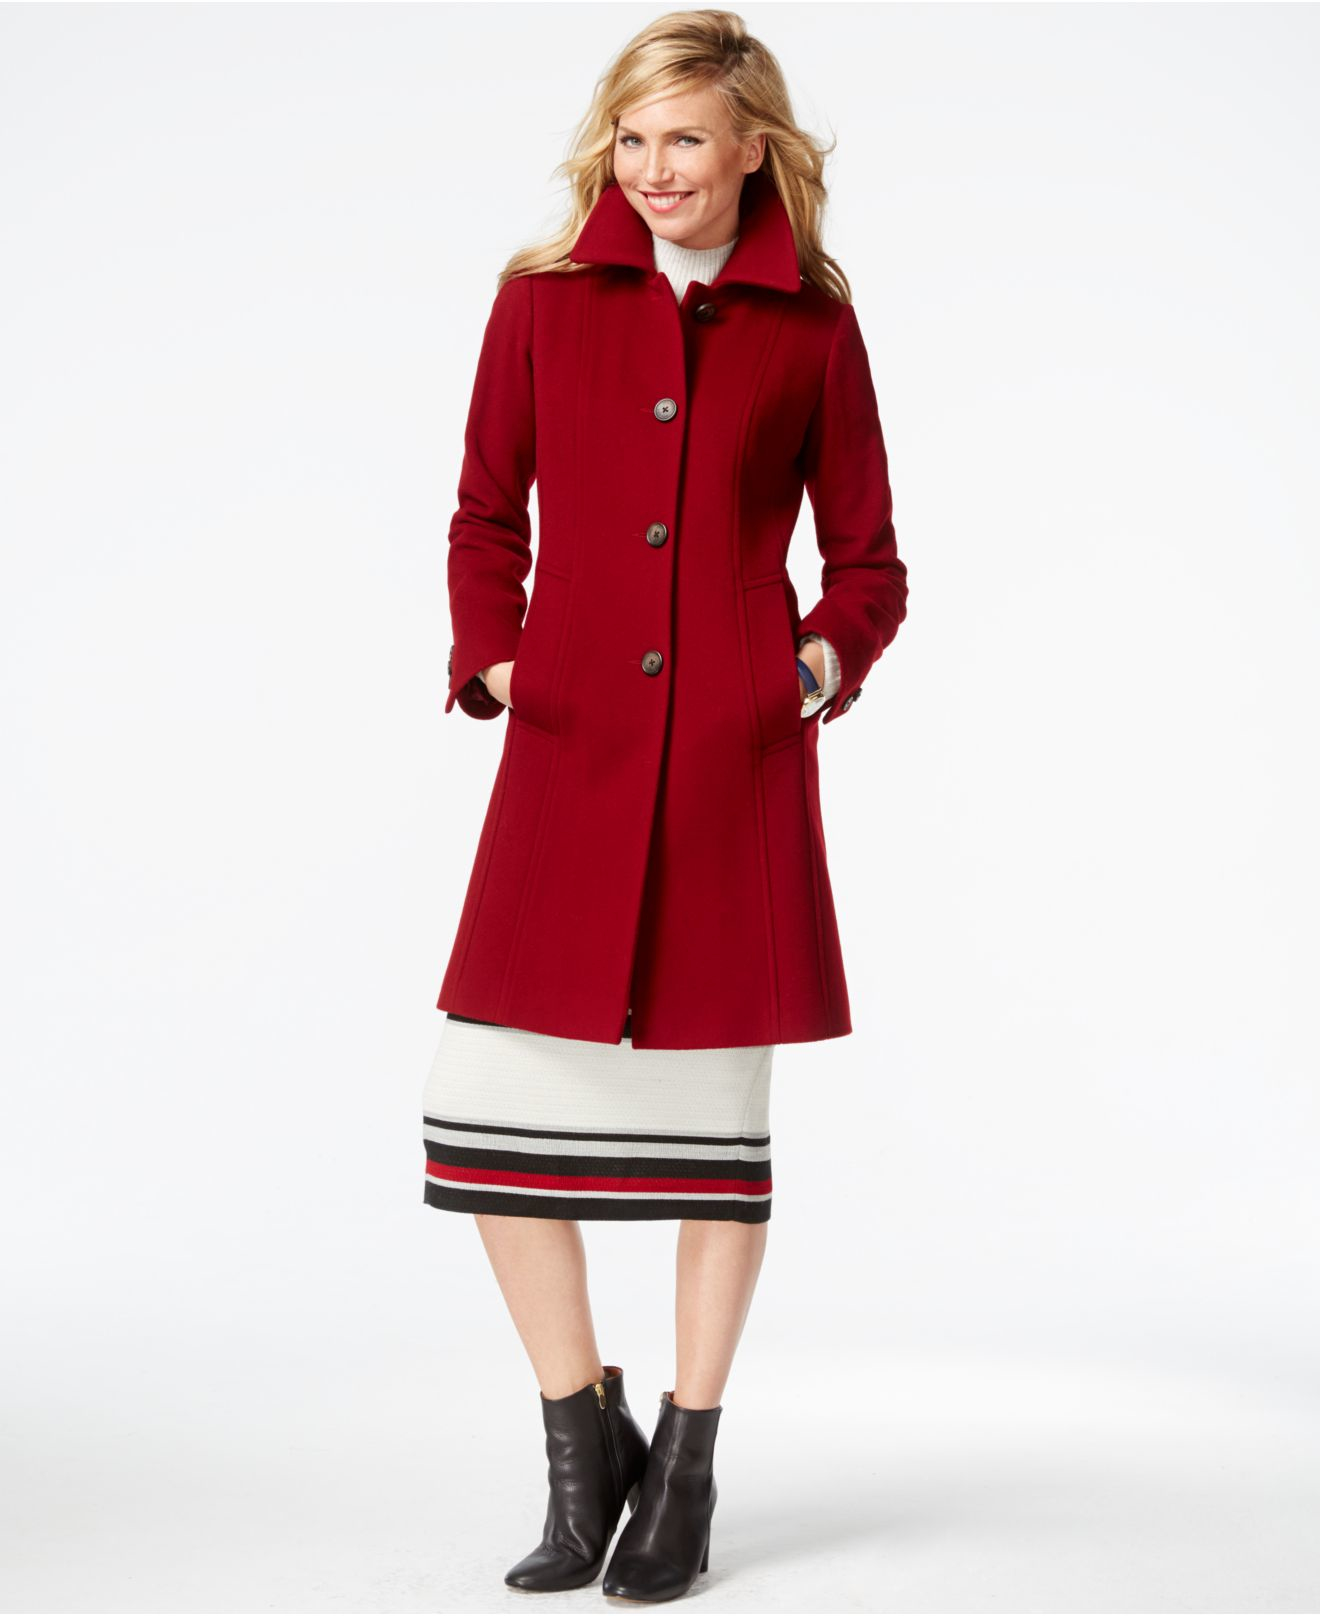 Anne Klein Wool Cashmere Coat Photo Album - Reikian